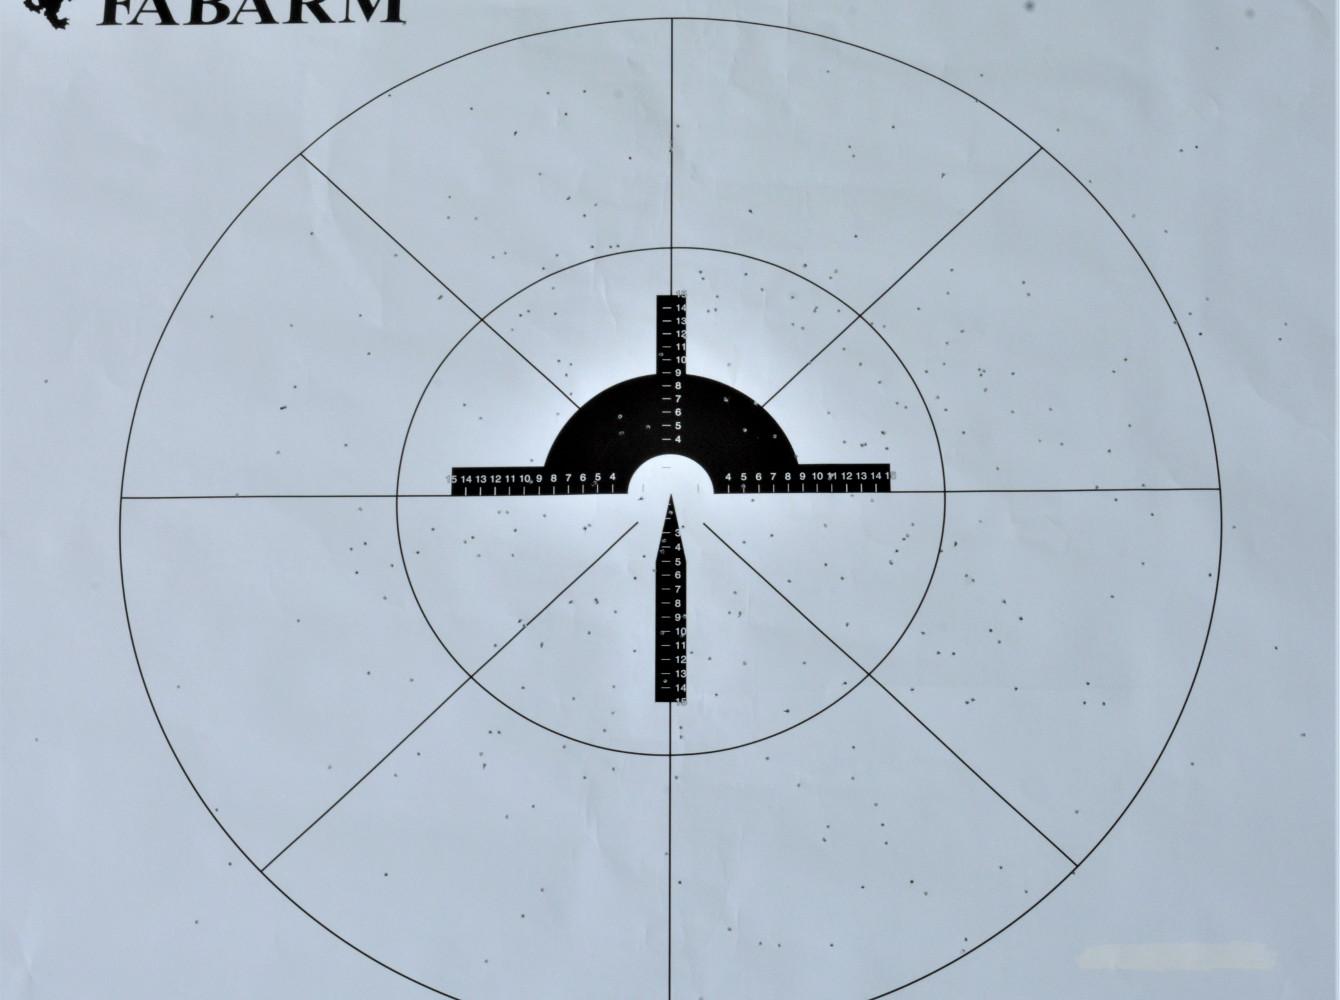 pegoraro, prova di rosata a 35 metri col fucile fabarm xlr columba palumbus